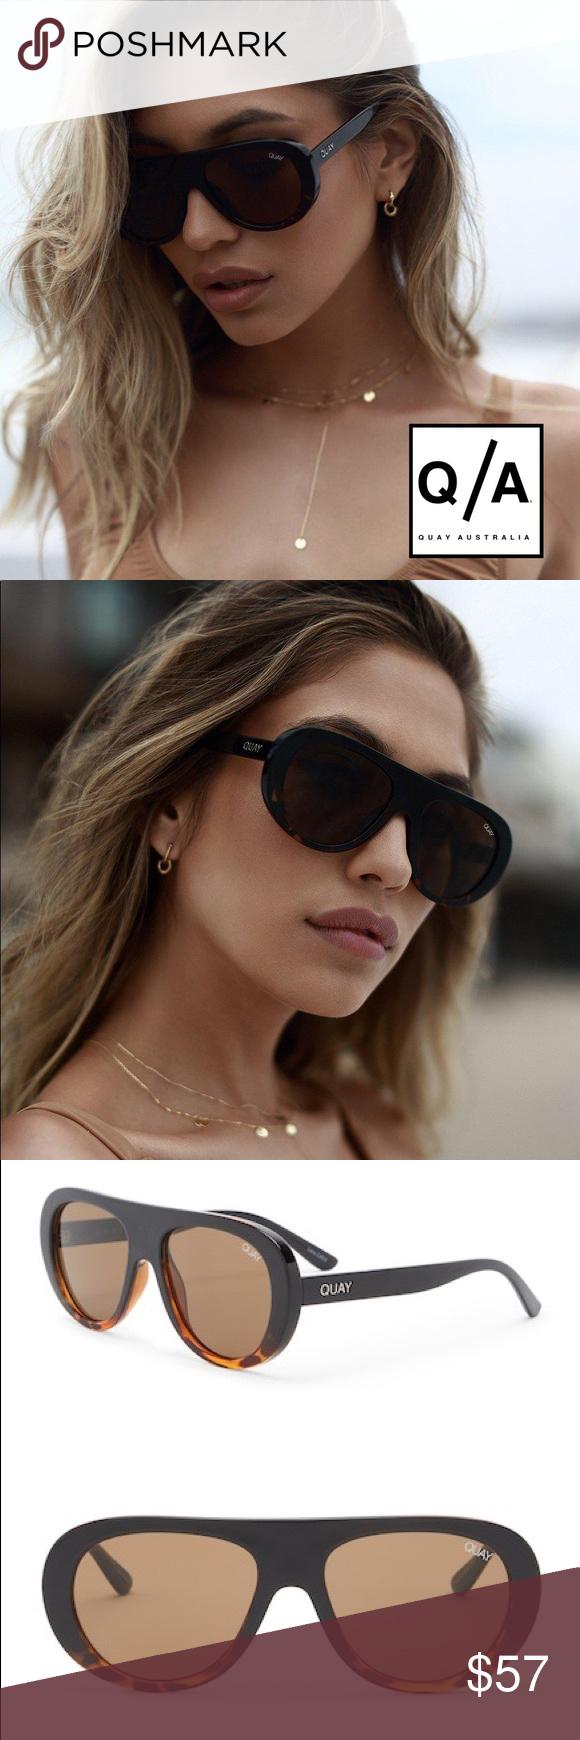 37ea36c41b NWT Quay Australia Bold Move Aviator Sunglasses ➖NWT ➖BRAND  Quay Australia  ➖STYLE